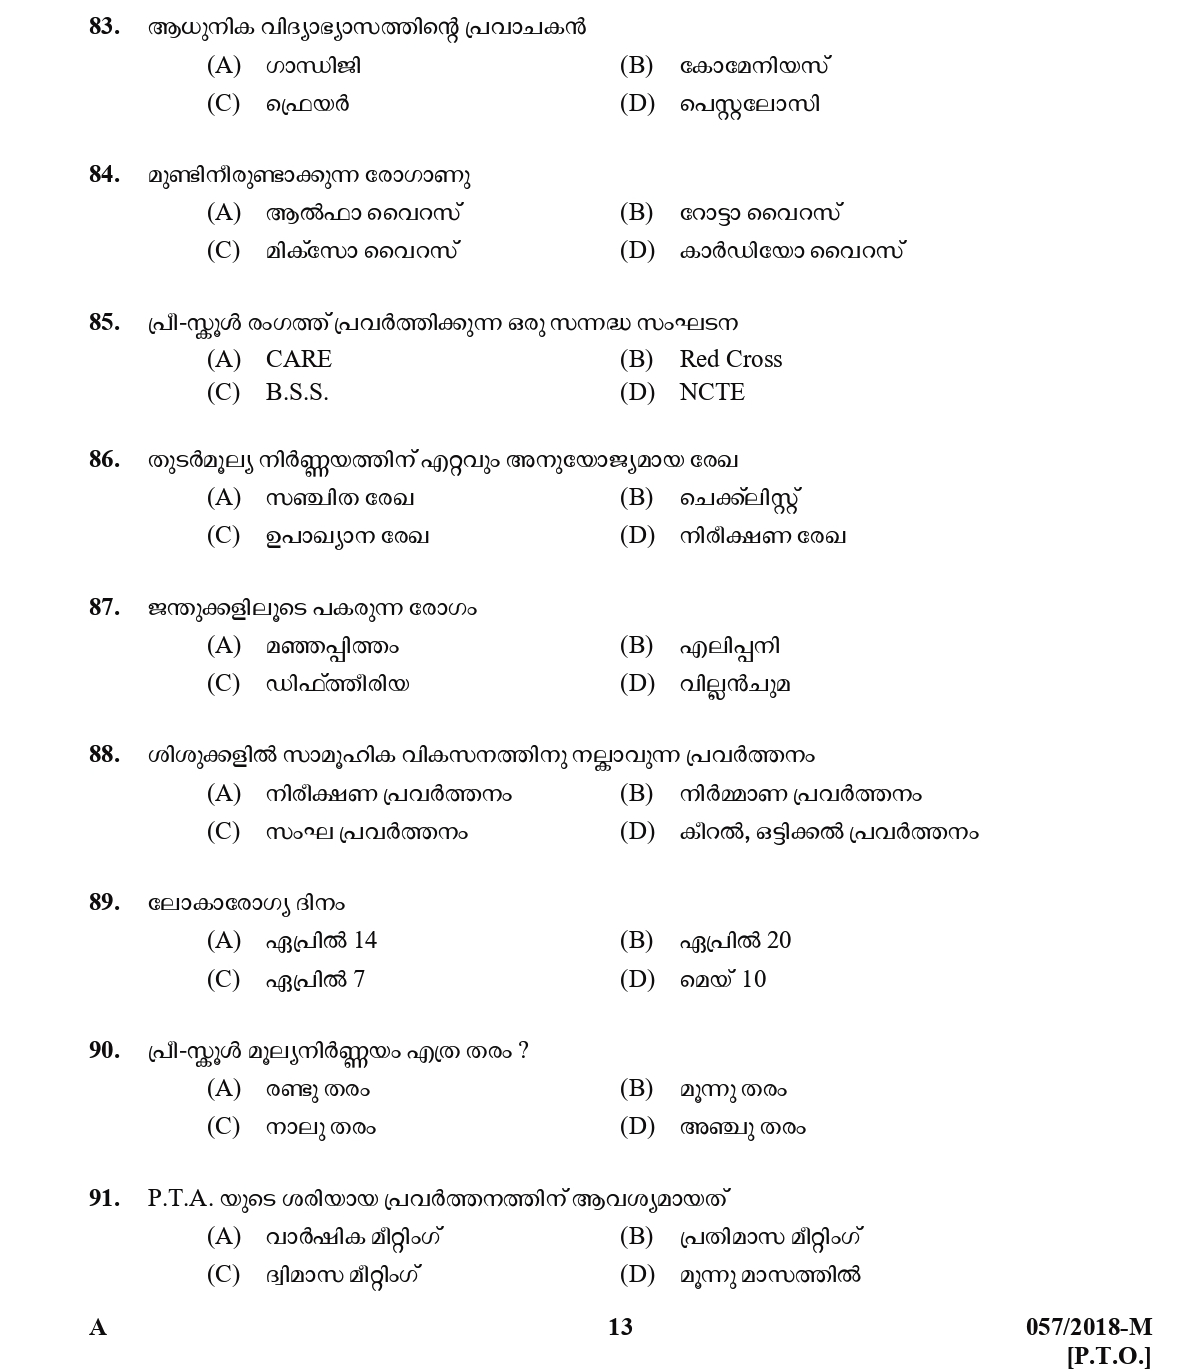 Nursery Teacher  Question Paper with Answer Key 57/2018 - Kerala PSC